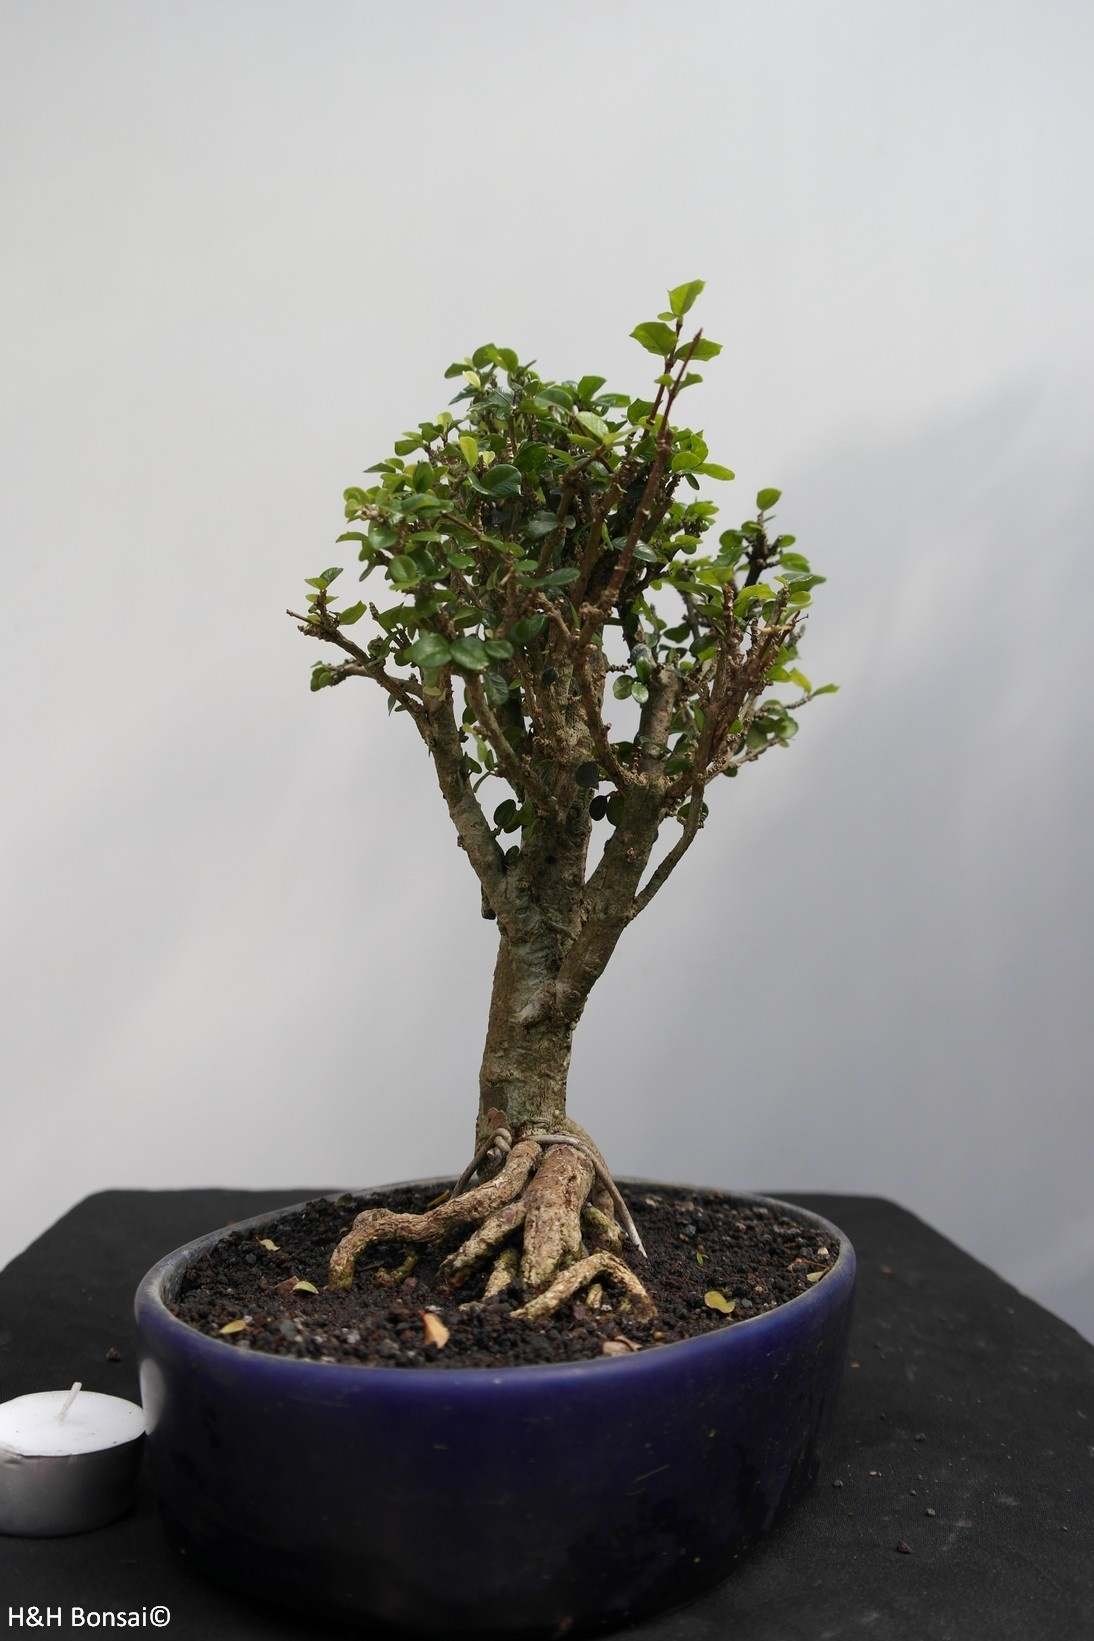 Bonsai Barbados Cherry, Malpighia coccigera, no. 7851